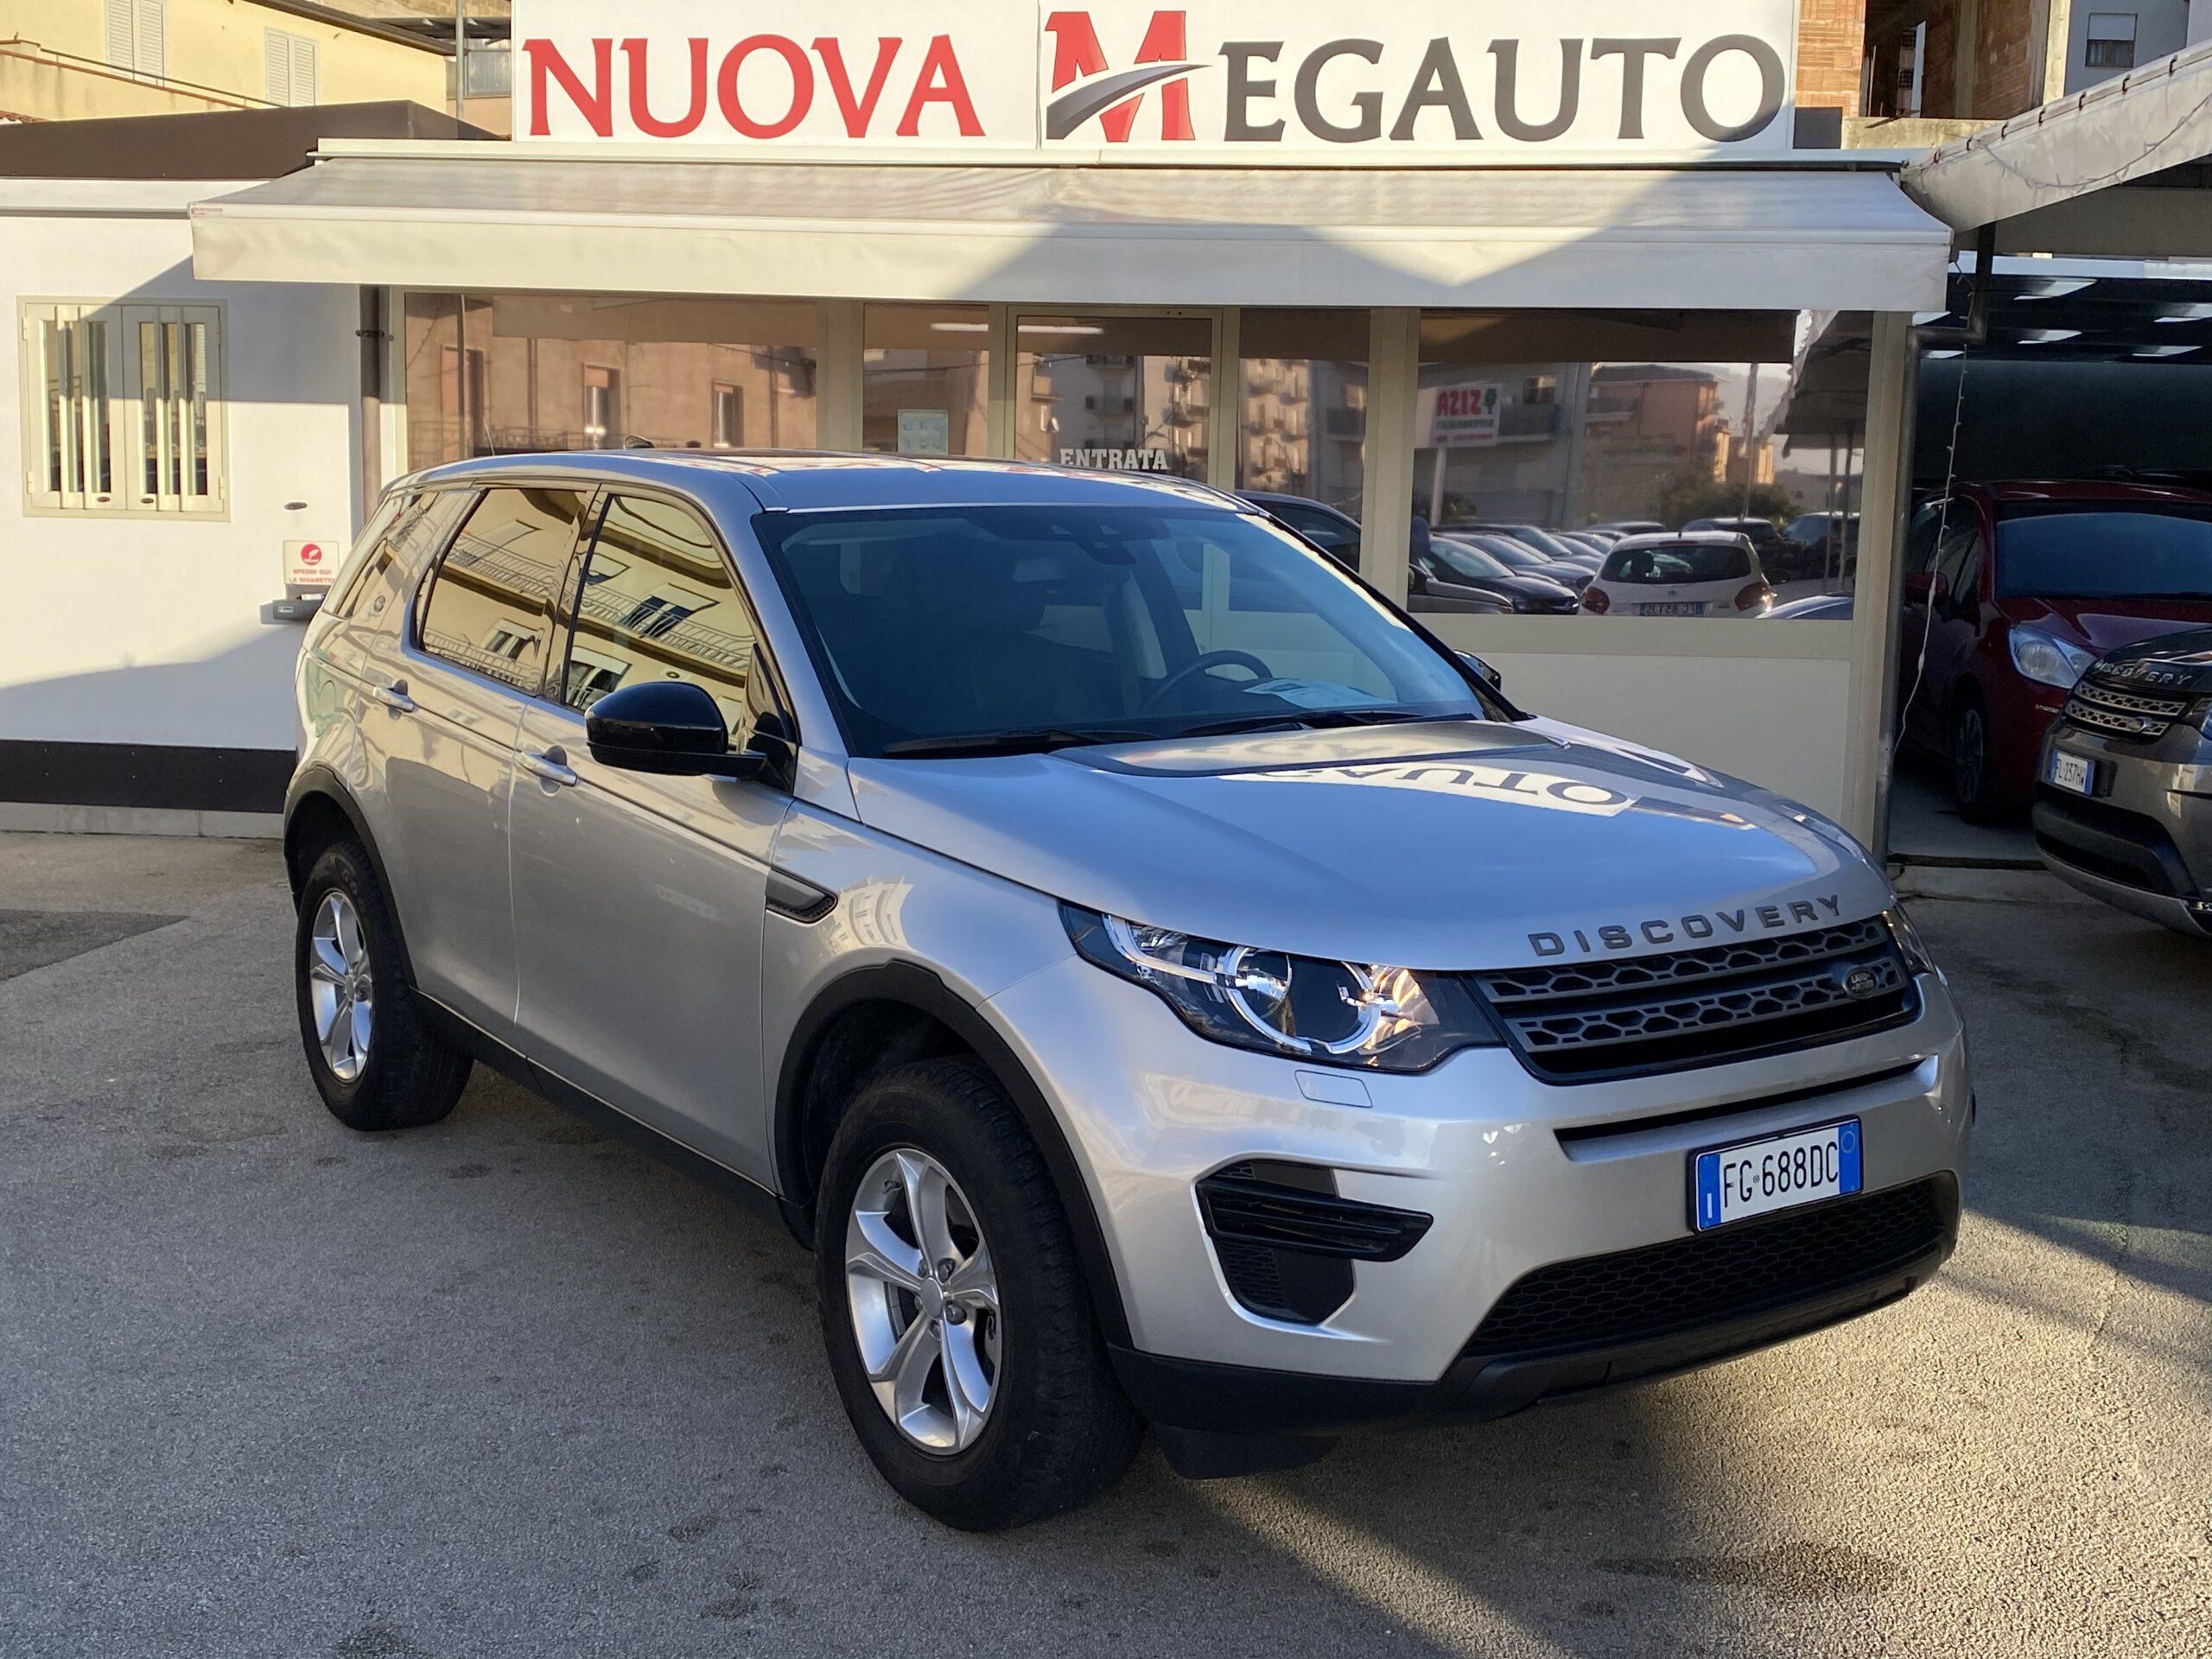 Land Rover Discovery Sport 2.0 TD4 180 CV Auto Business SE 2017